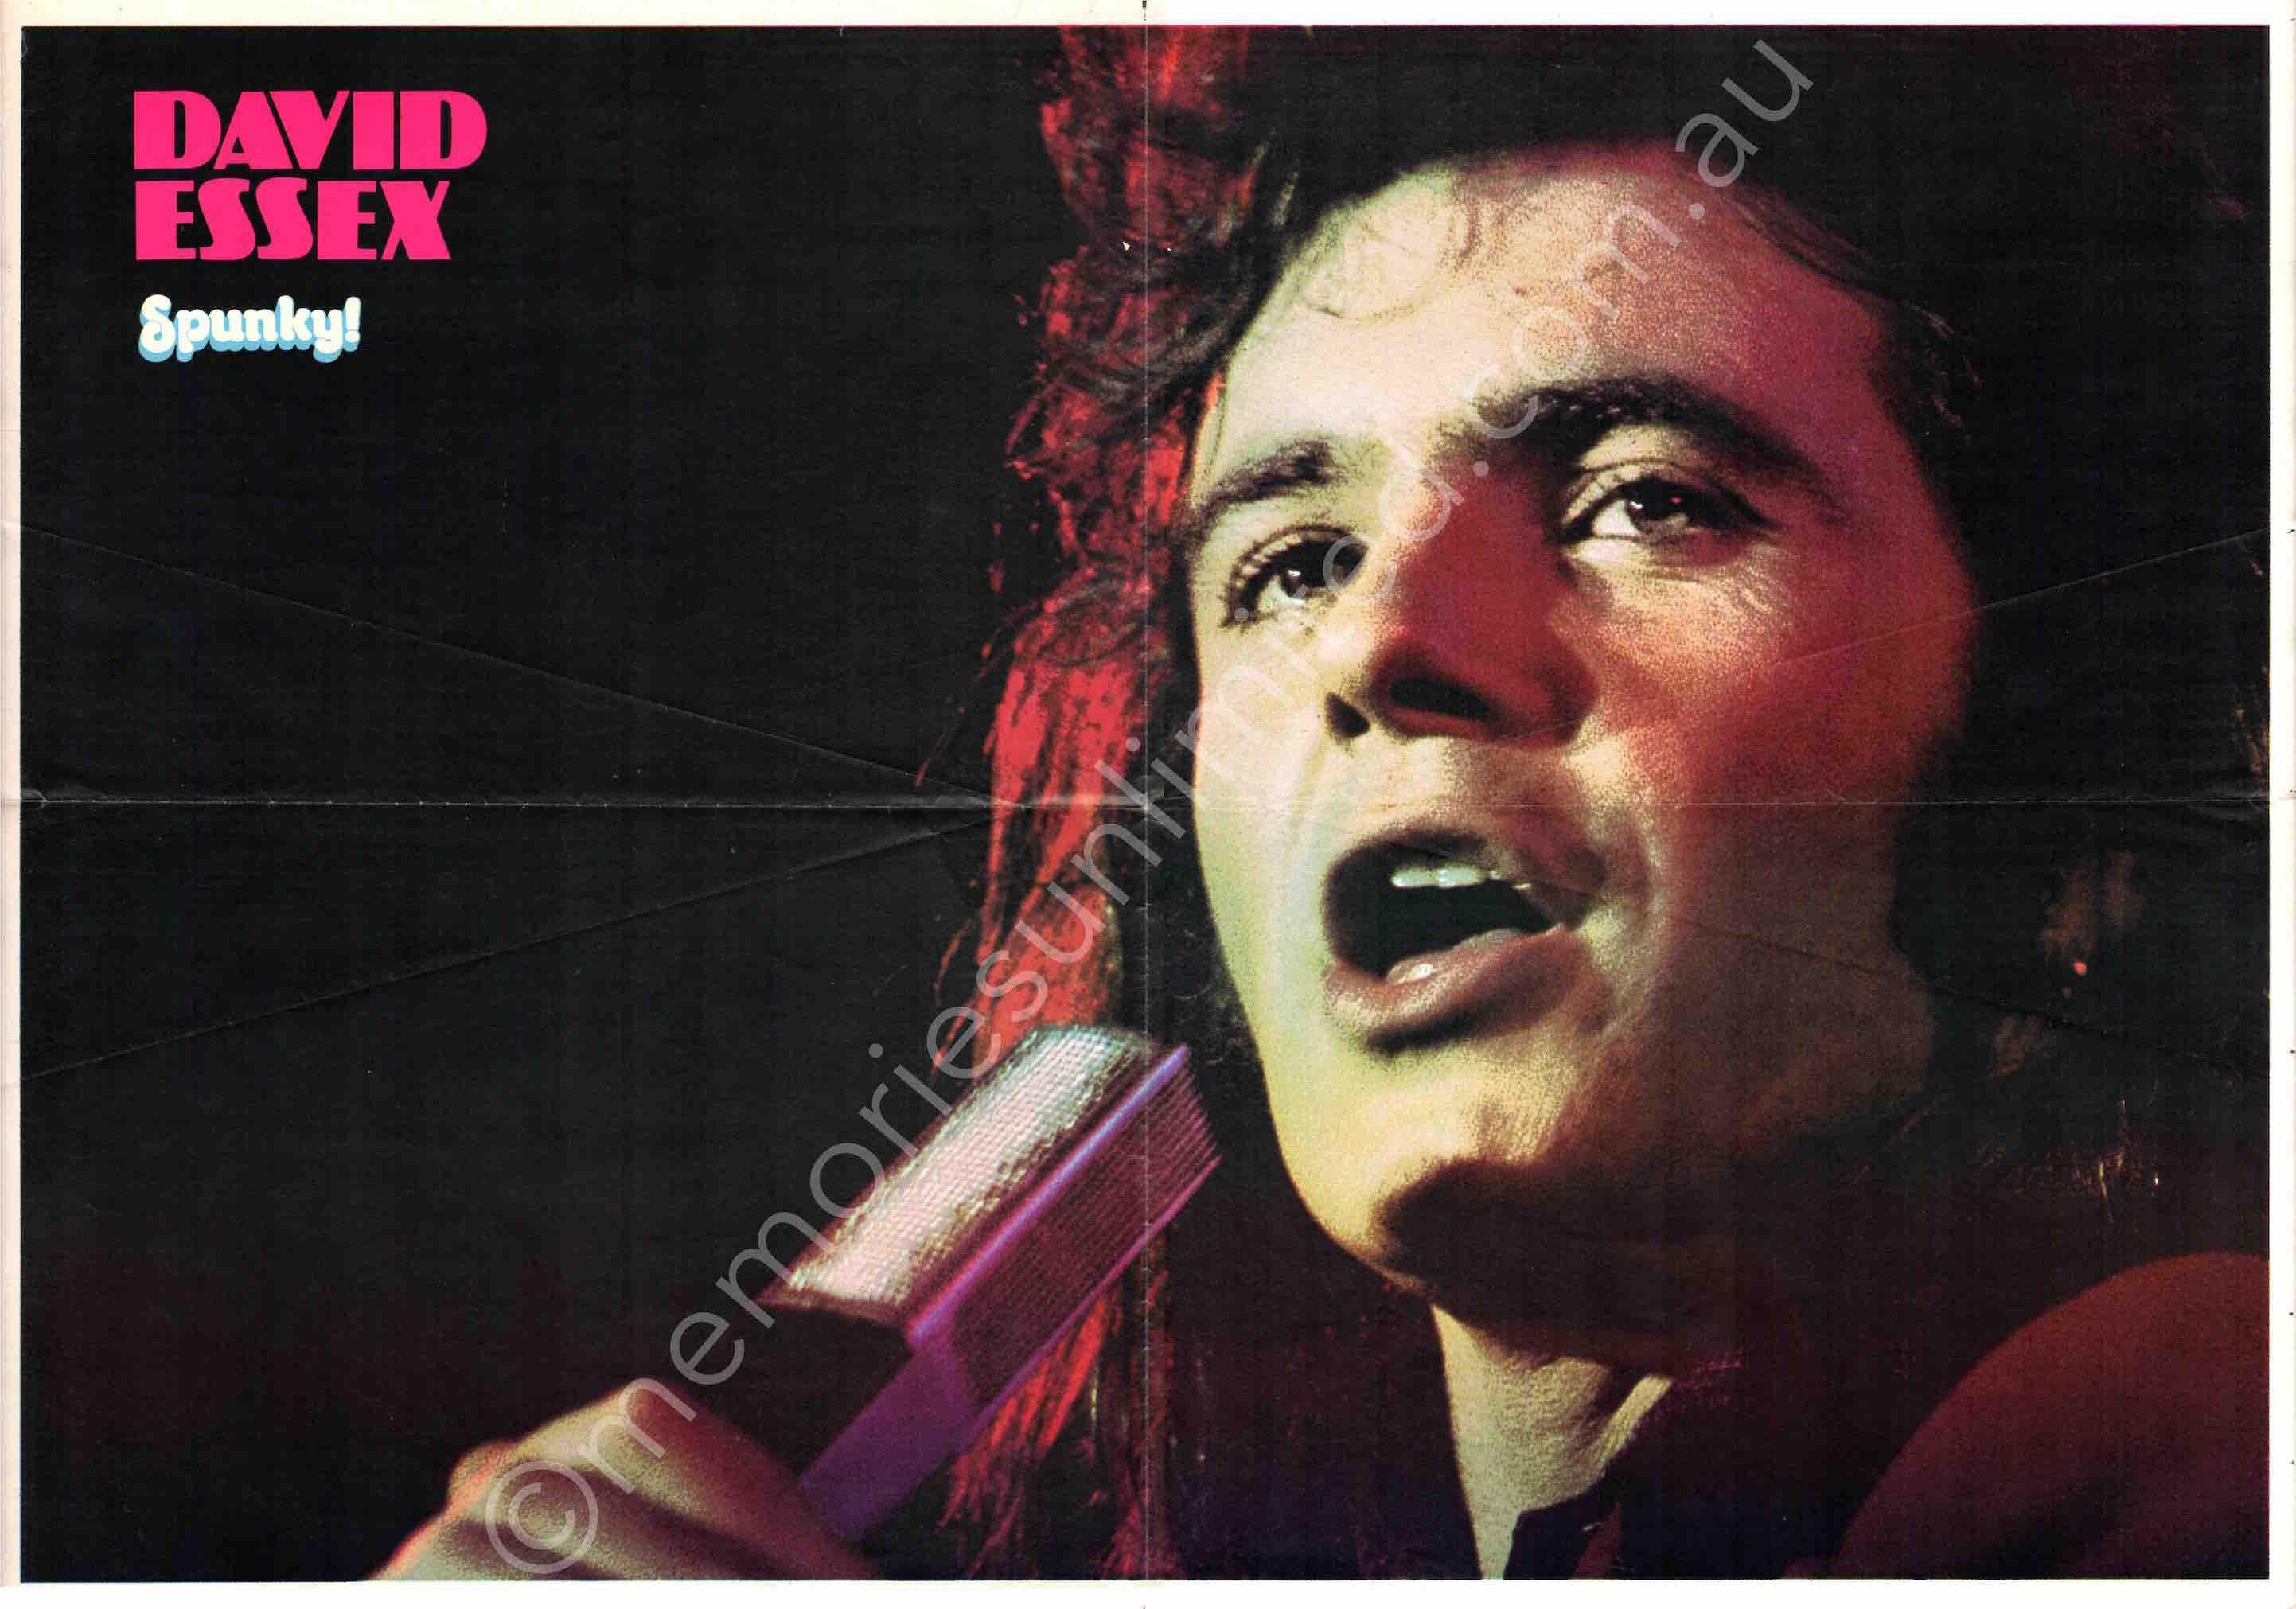 Spunky! 1 Supplement Poster David Essex Memories